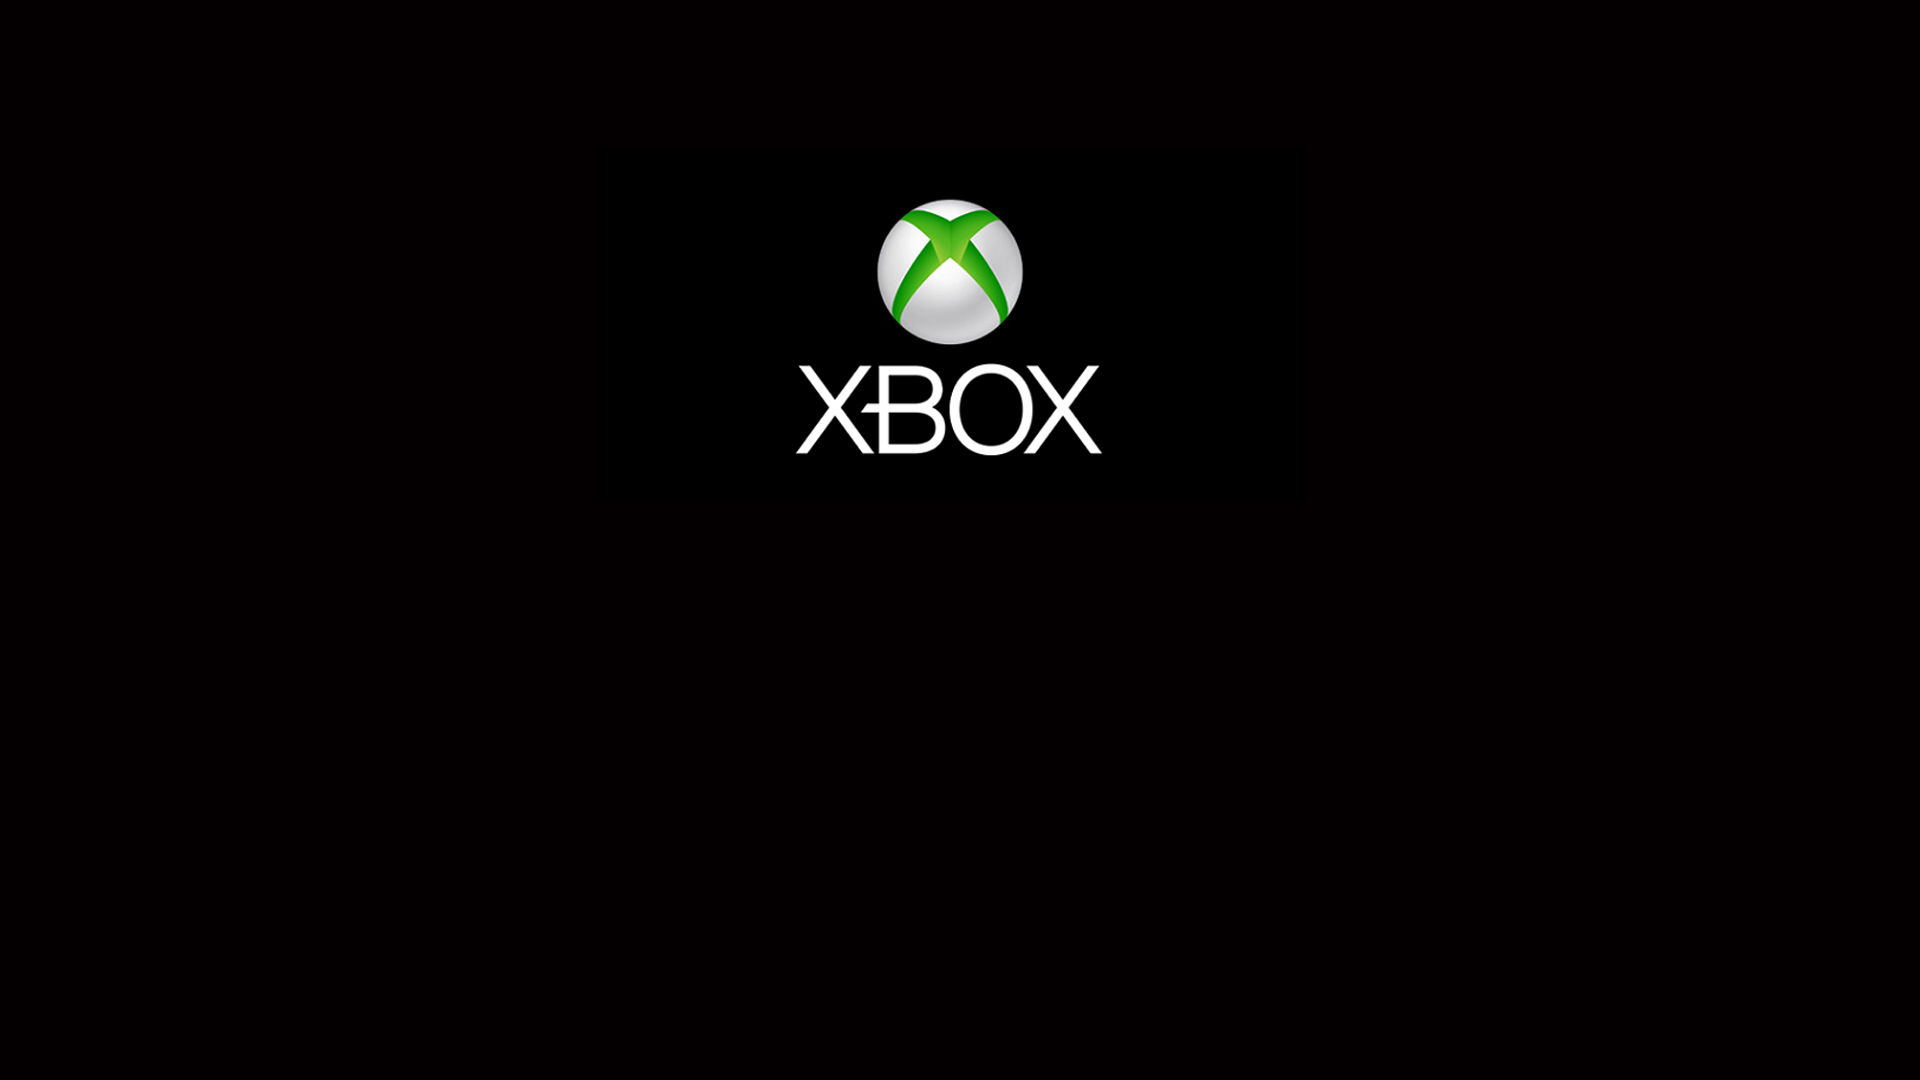 Xbox Wallpaper 32